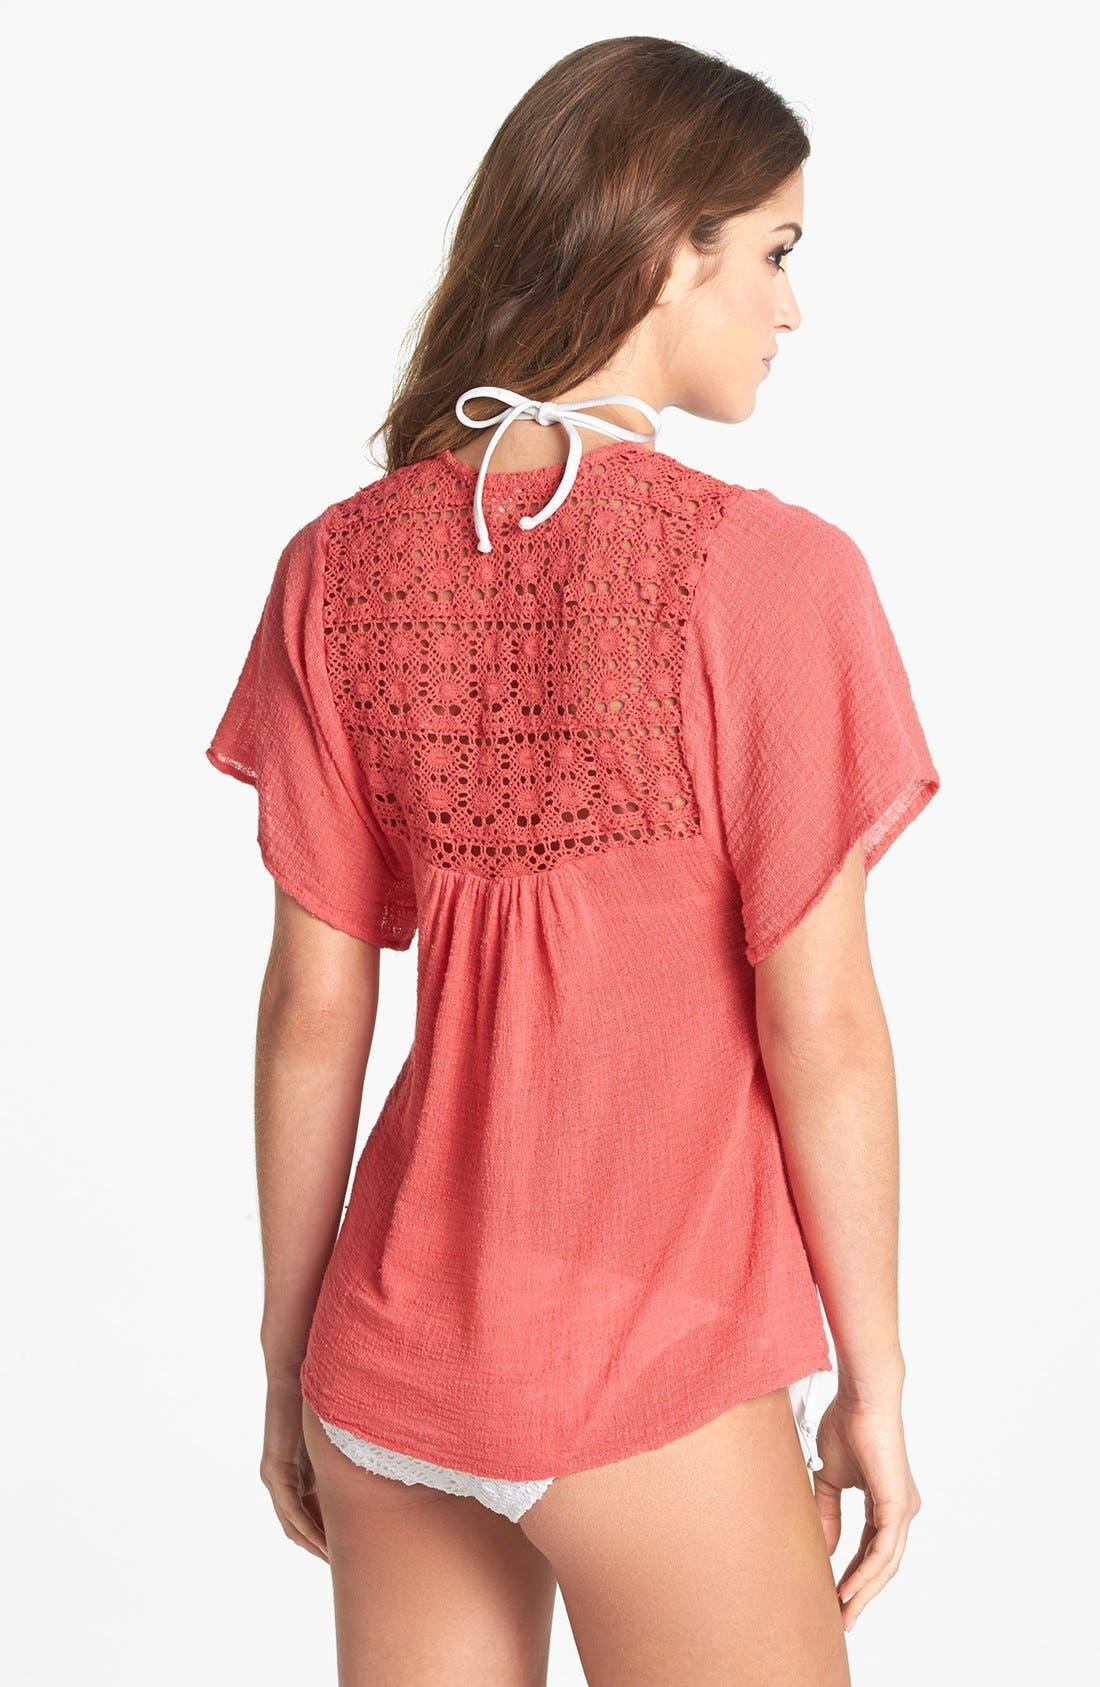 Alternate Image 2  - Surf Gypsy Crochet Top